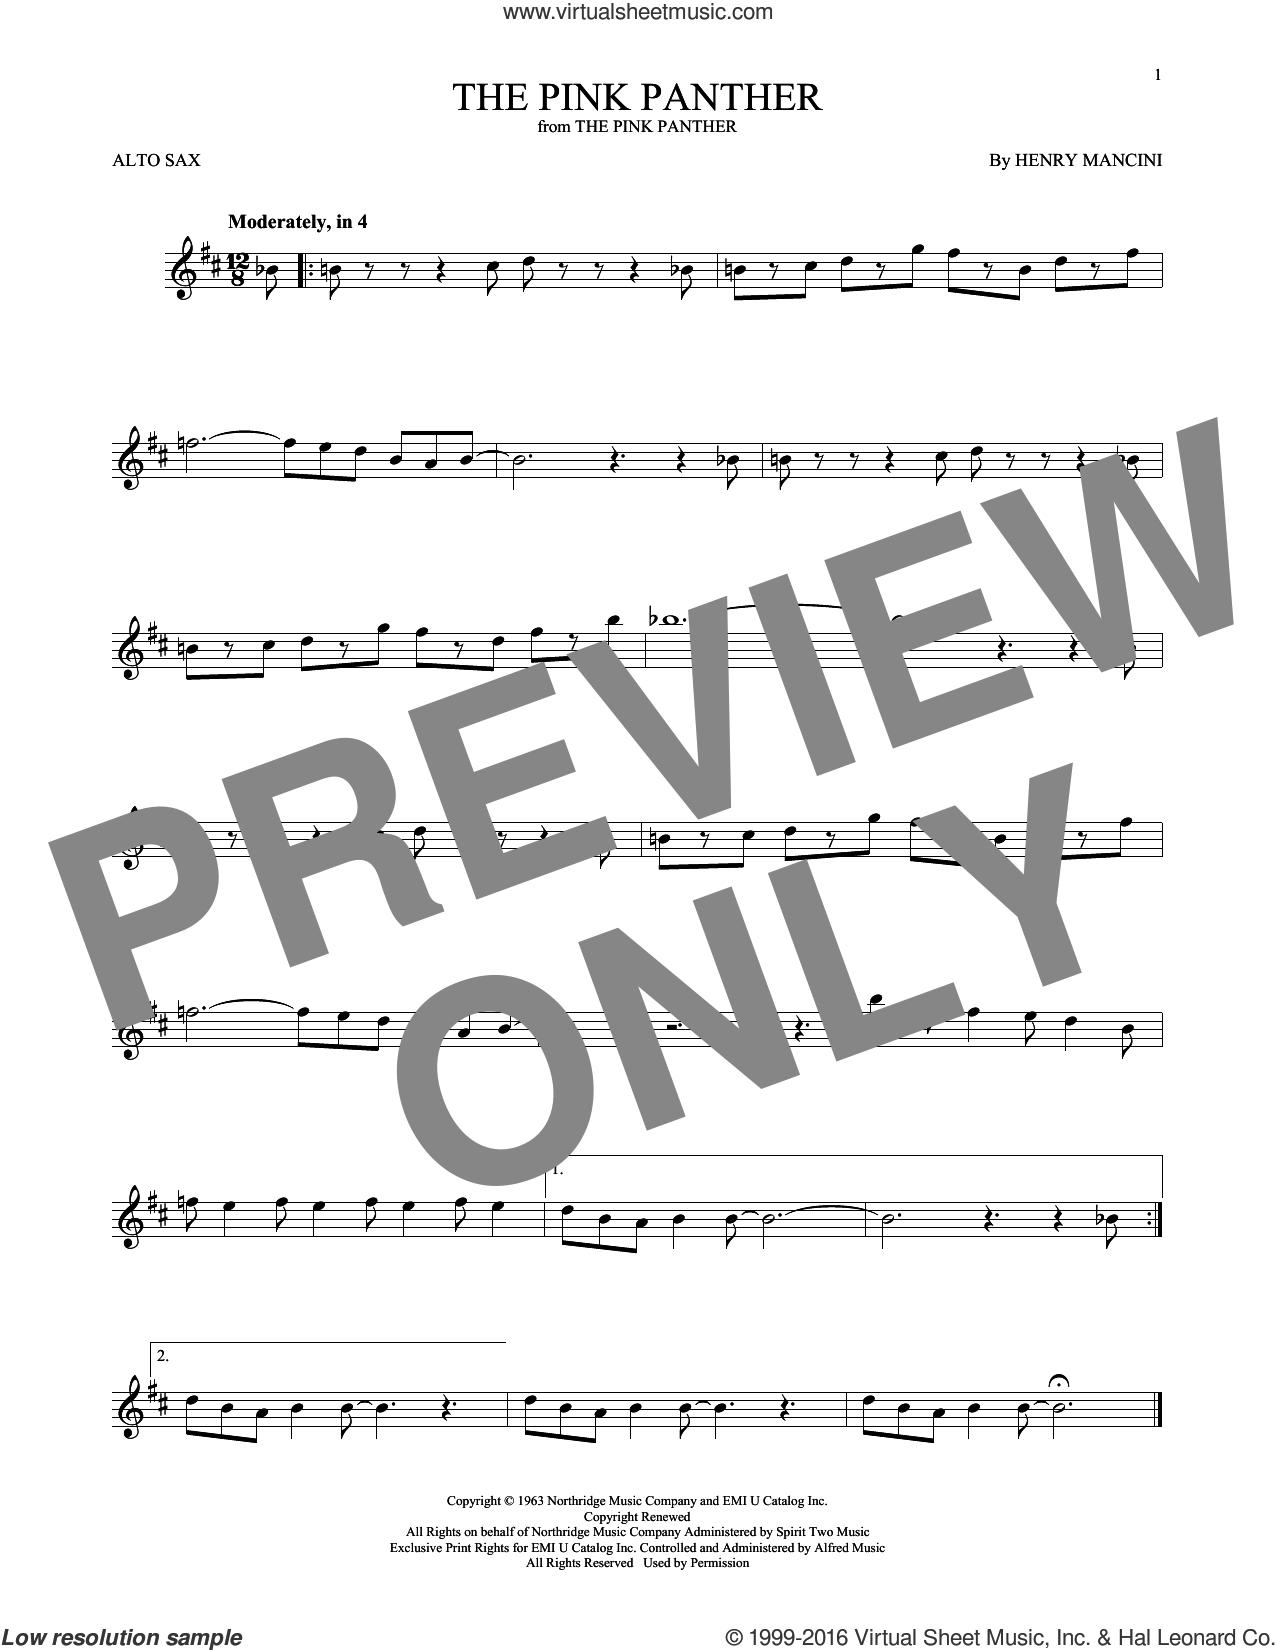 Mancini - The Pink Panther Sheet Music For Alto Saxophone Solo - Free Printable Alto Saxophone Sheet Music Pink Panther